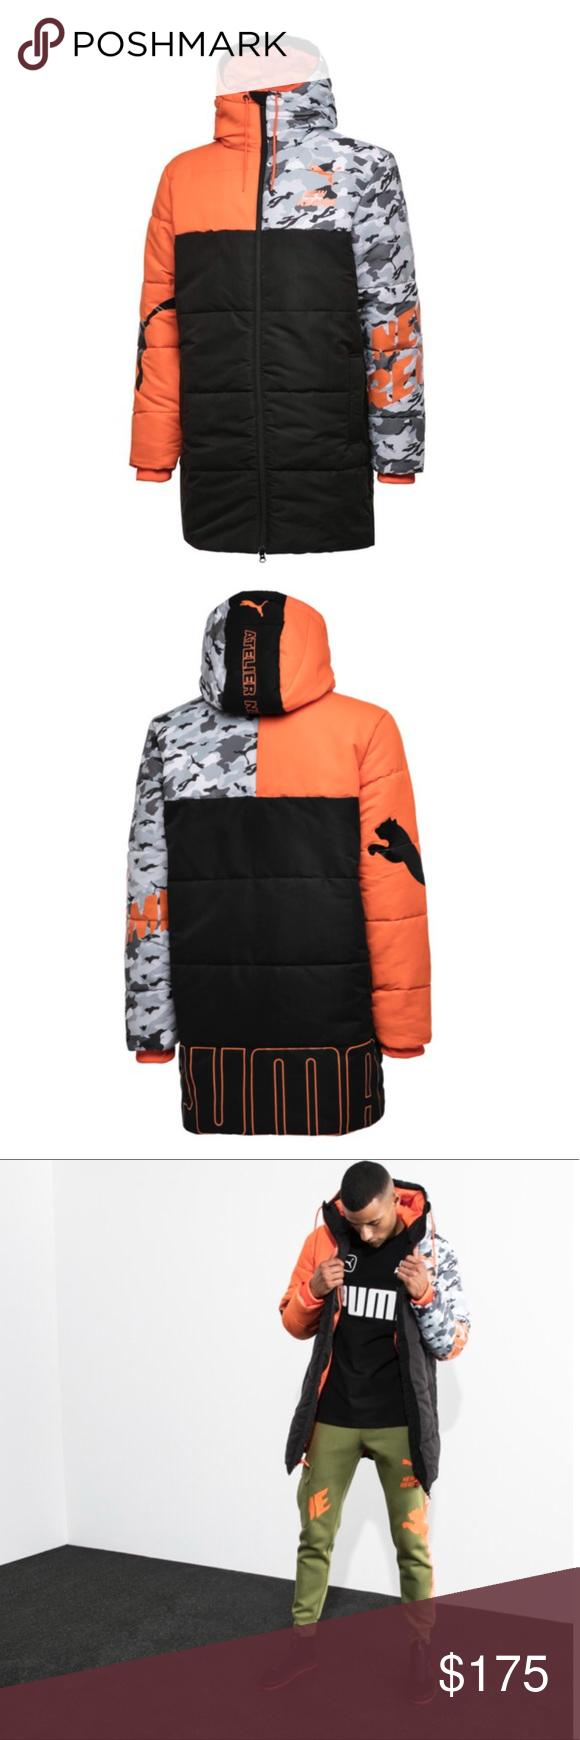 Nwt Puma X Atelier New Regime Camo Hooded Jacket Jacket Brands Clothes Design Puma X [ 1740 x 580 Pixel ]